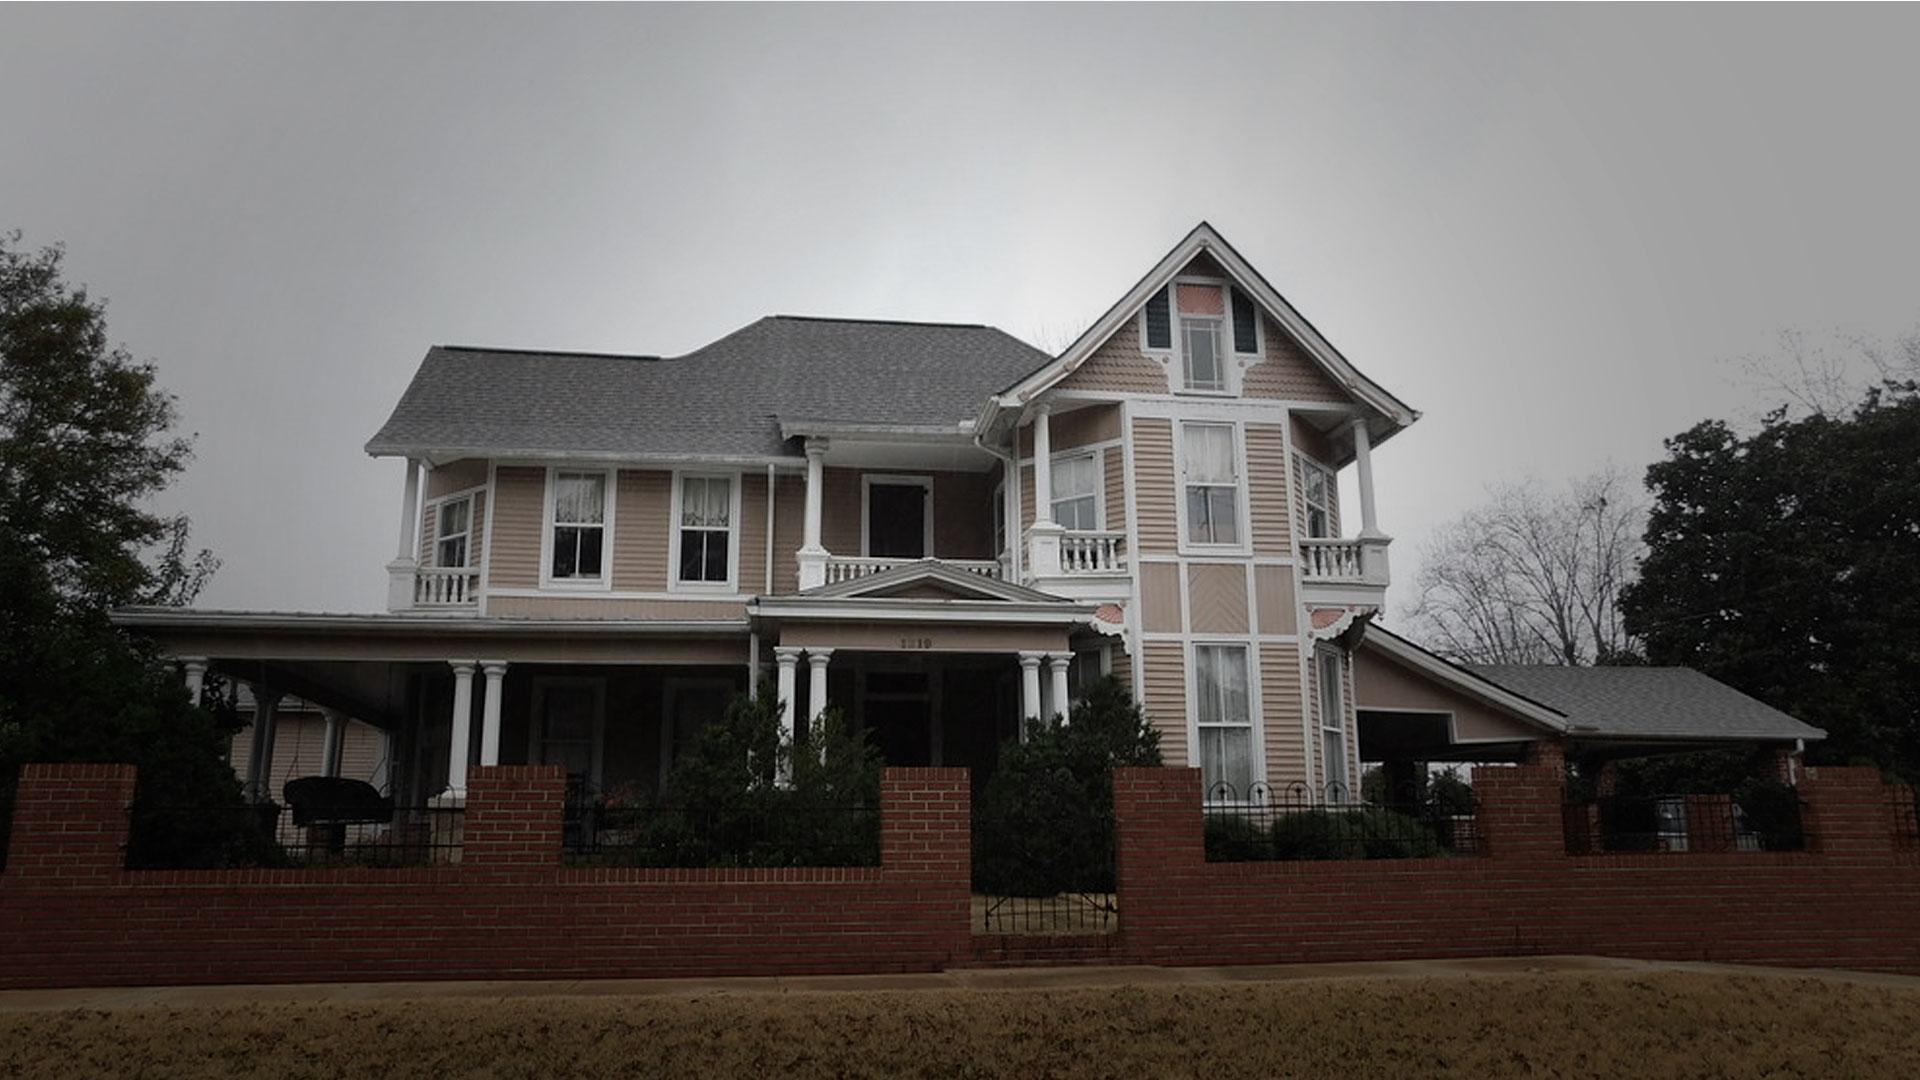 Roanoke, Alabama